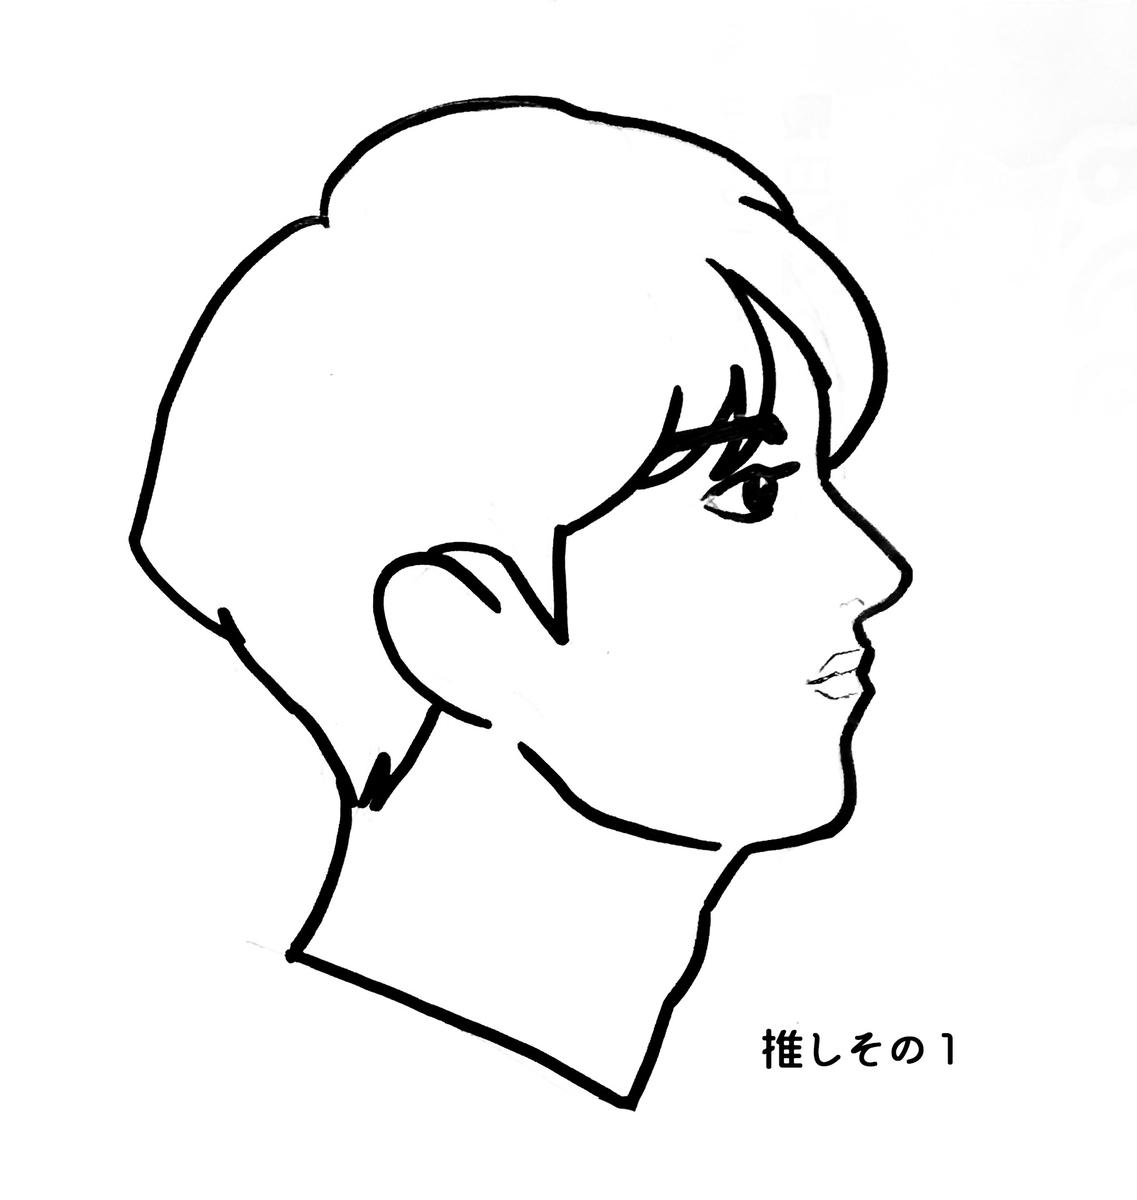 f:id:hayakawasetsuyaku:20200619193715j:plain